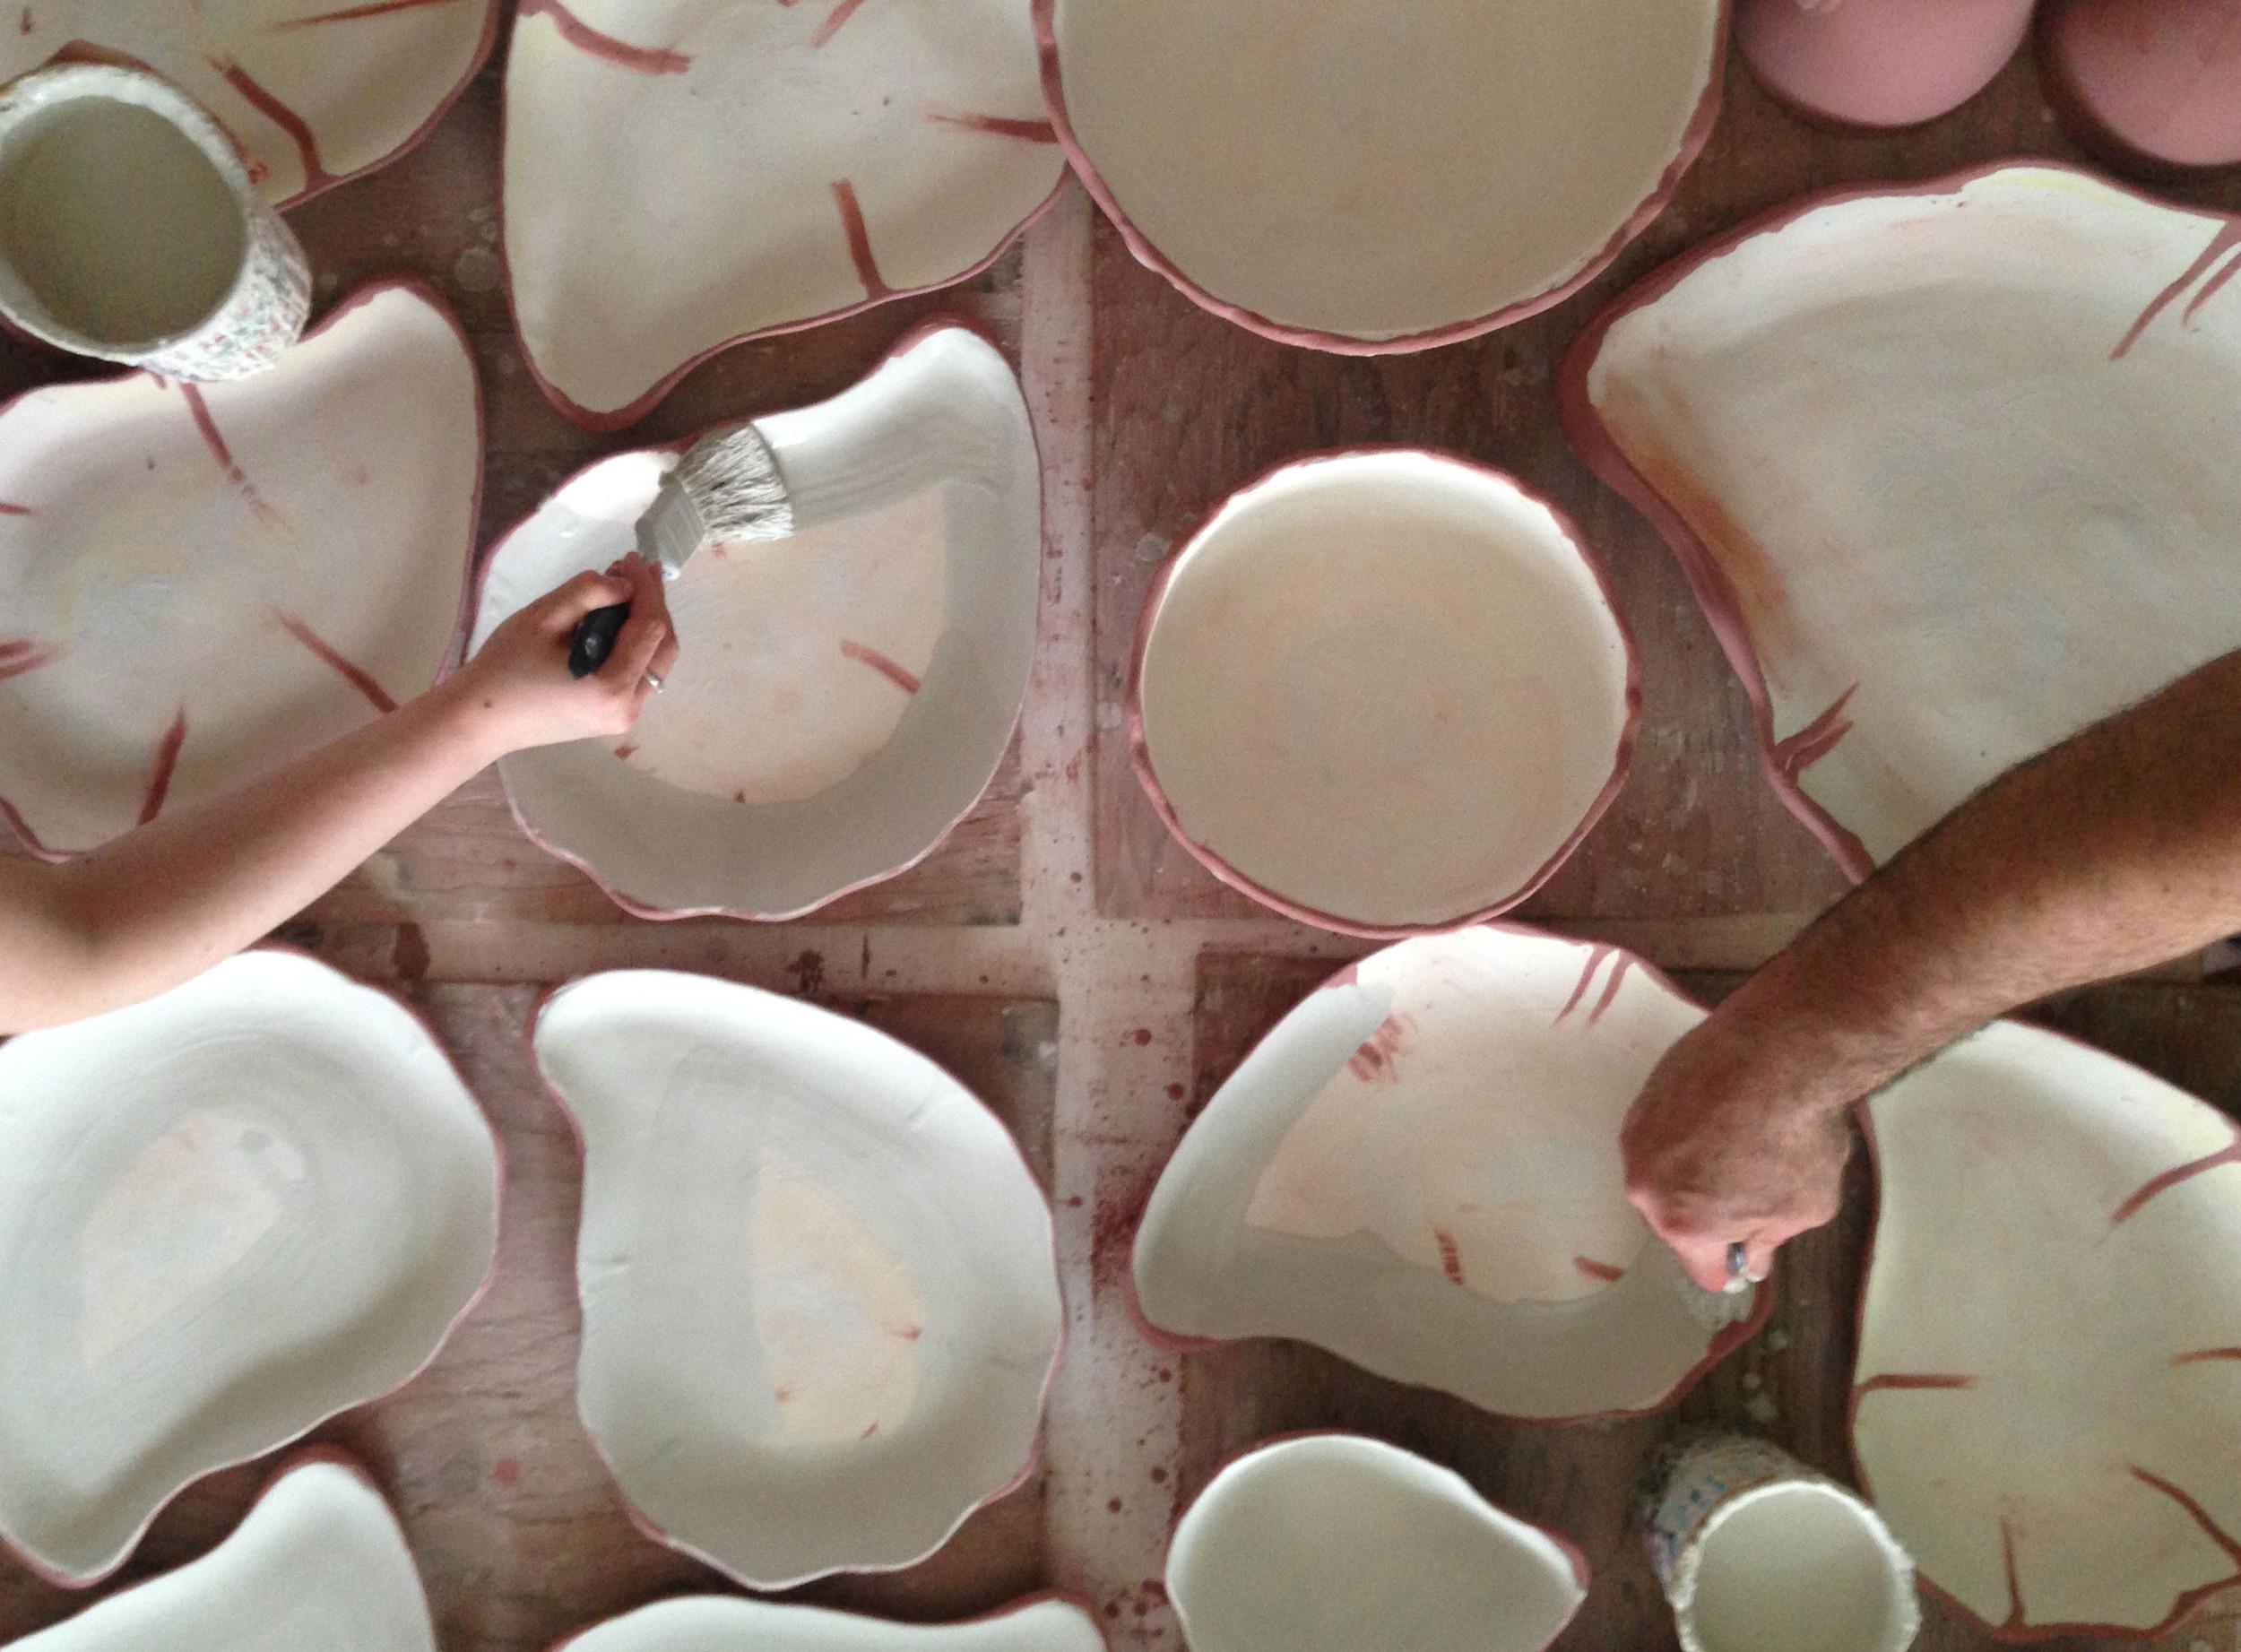 Painting Crystalline glaze on center of plates